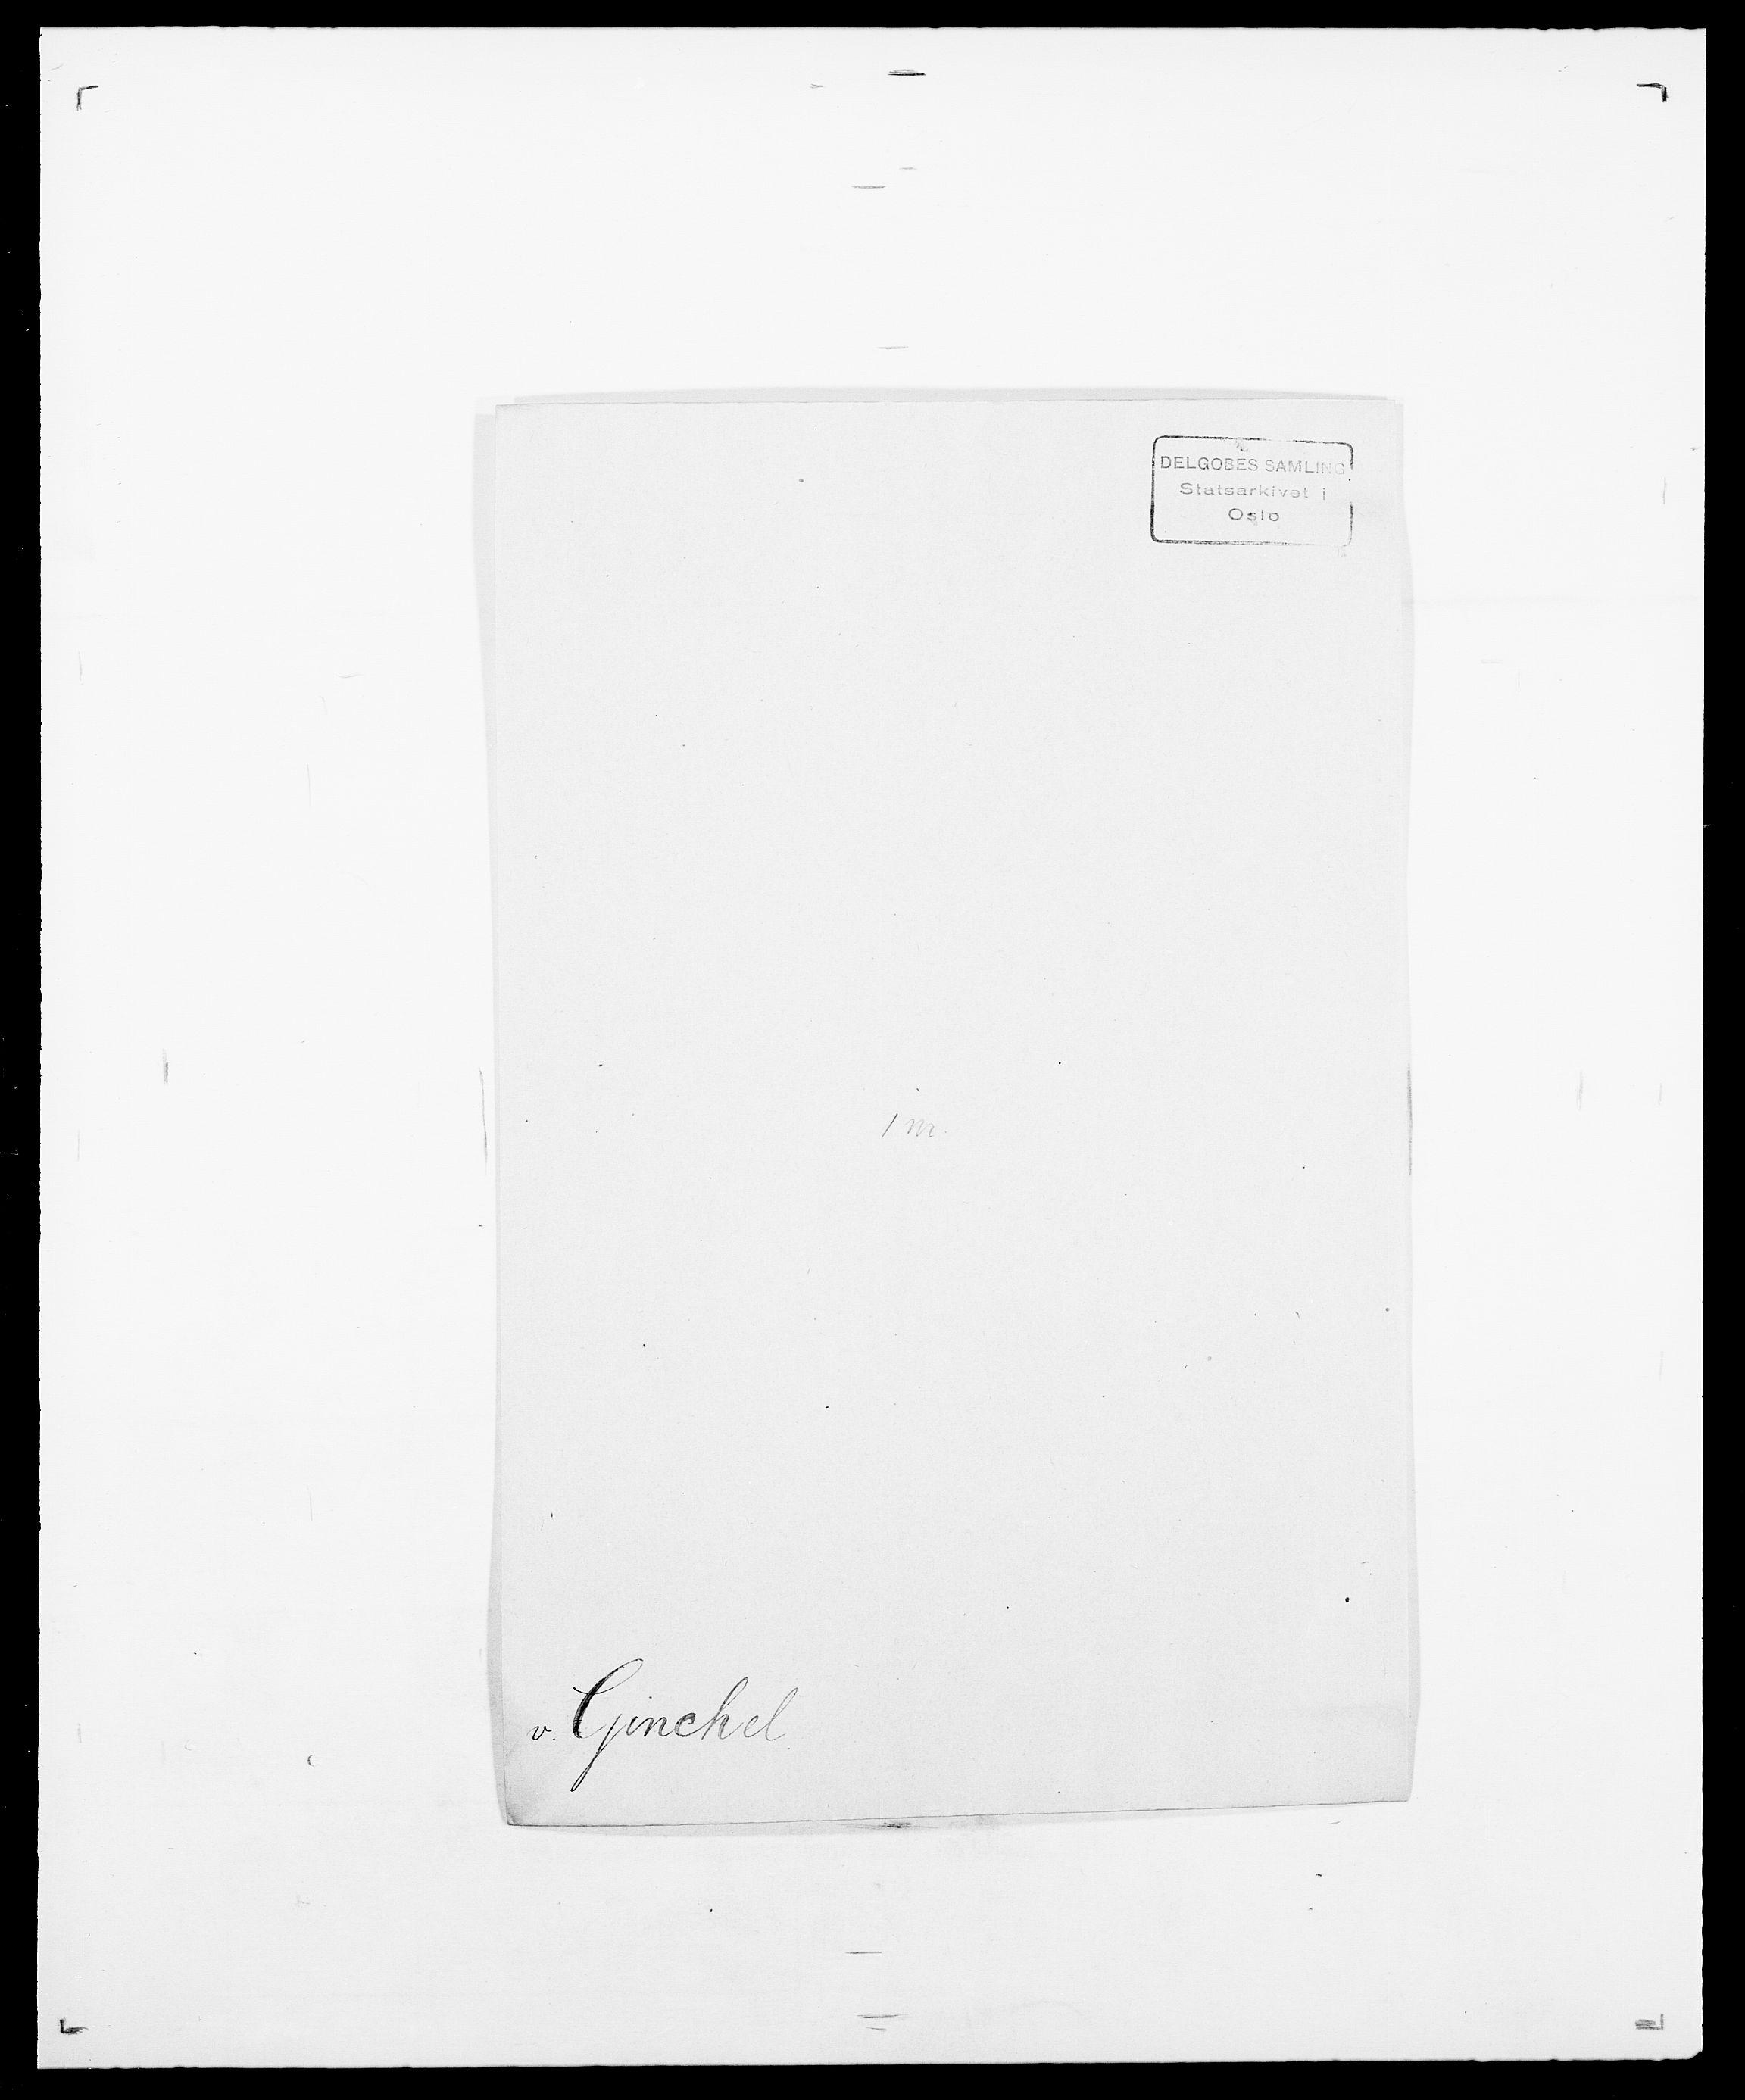 SAO, Delgobe, Charles Antoine - samling, D/Da/L0014: Giebdhausen - Grip, s. 37